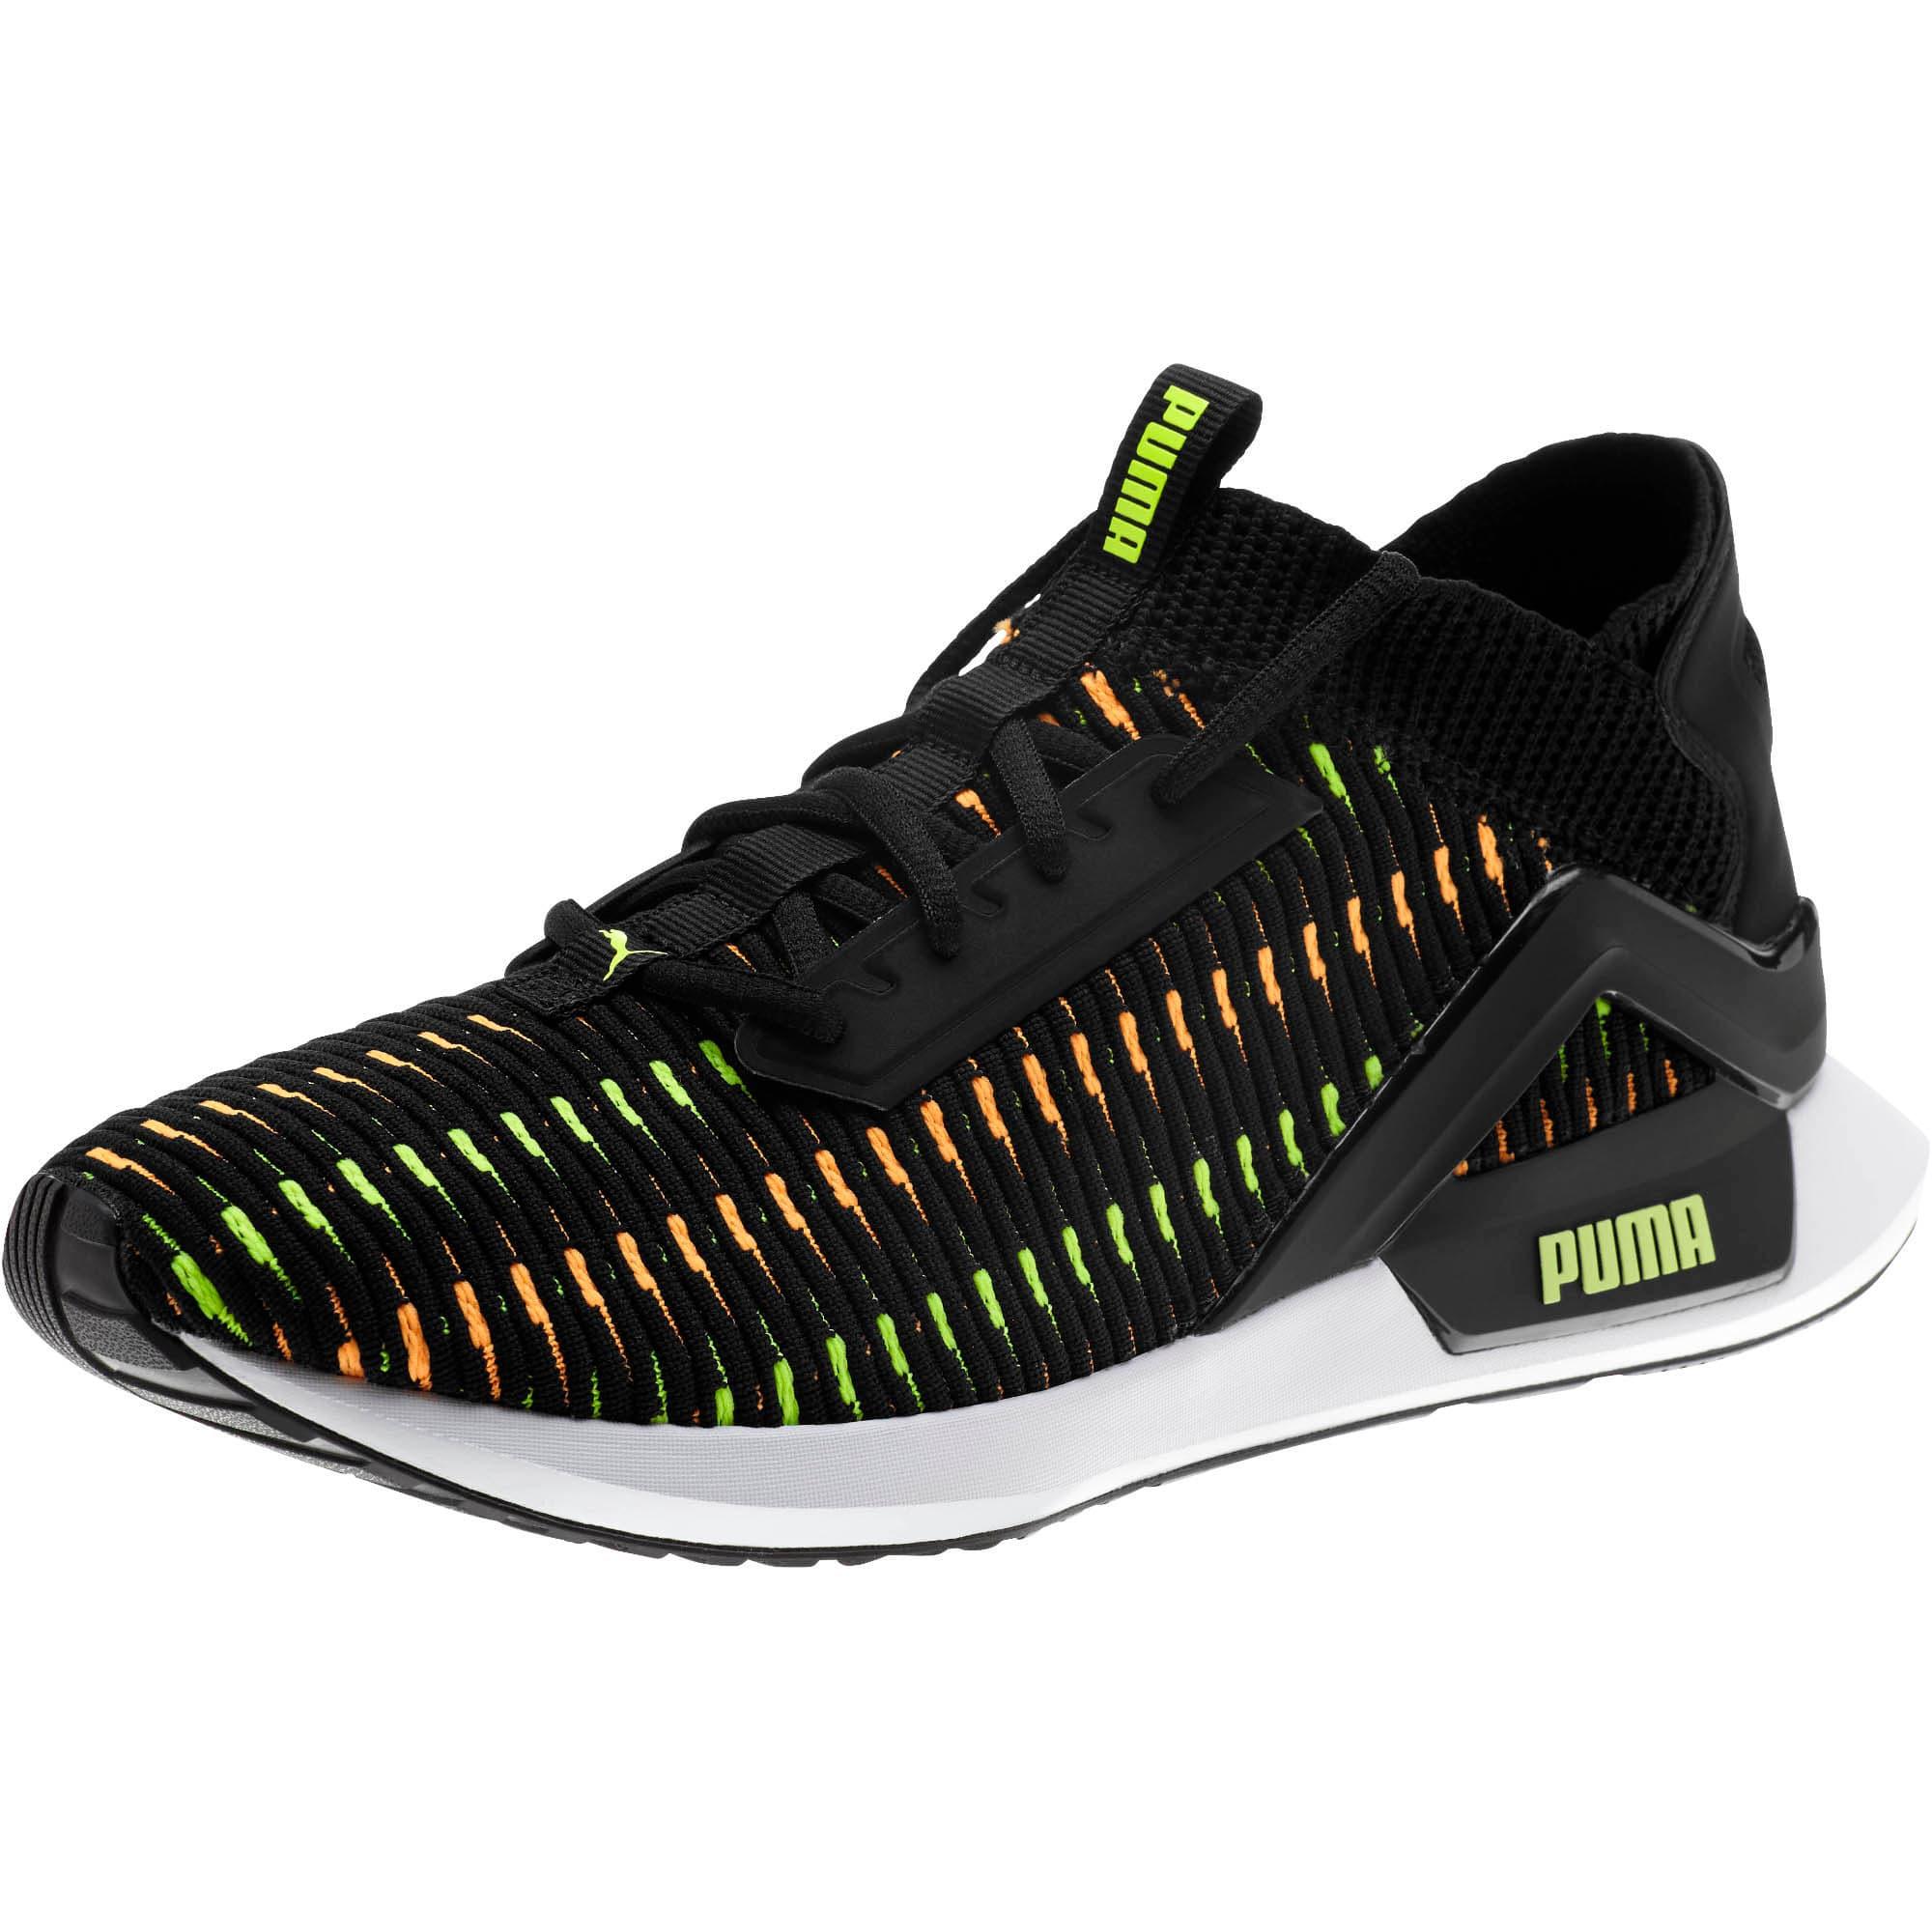 Thumbnail 1 of Rogue Corded Men's Sneakers, Puma Black-Orange Pop, medium